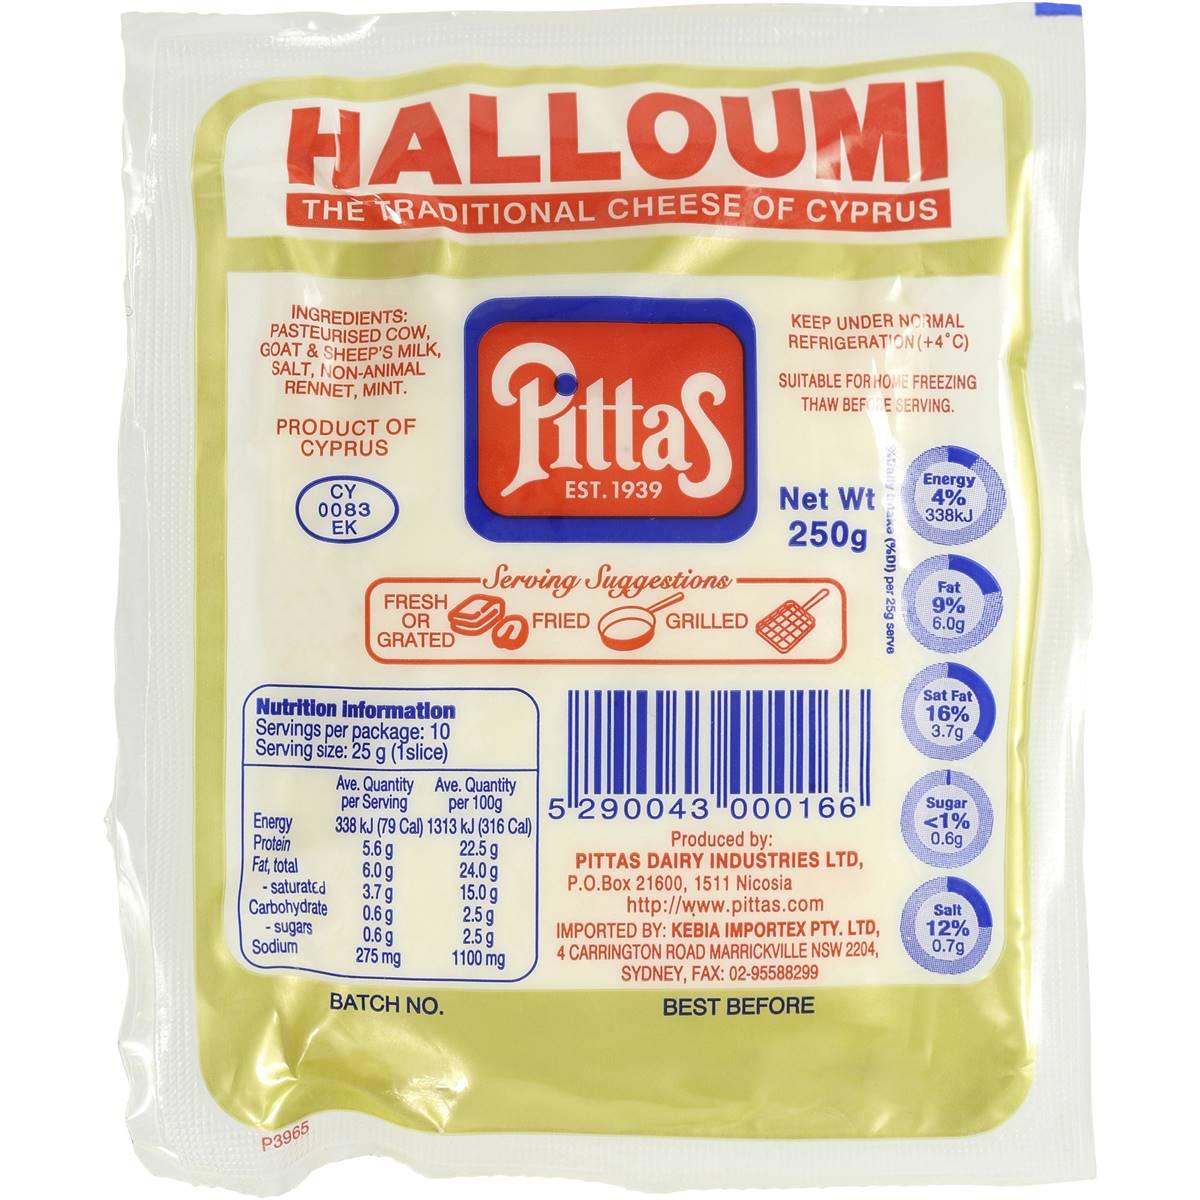 halloumi cheese where to buy